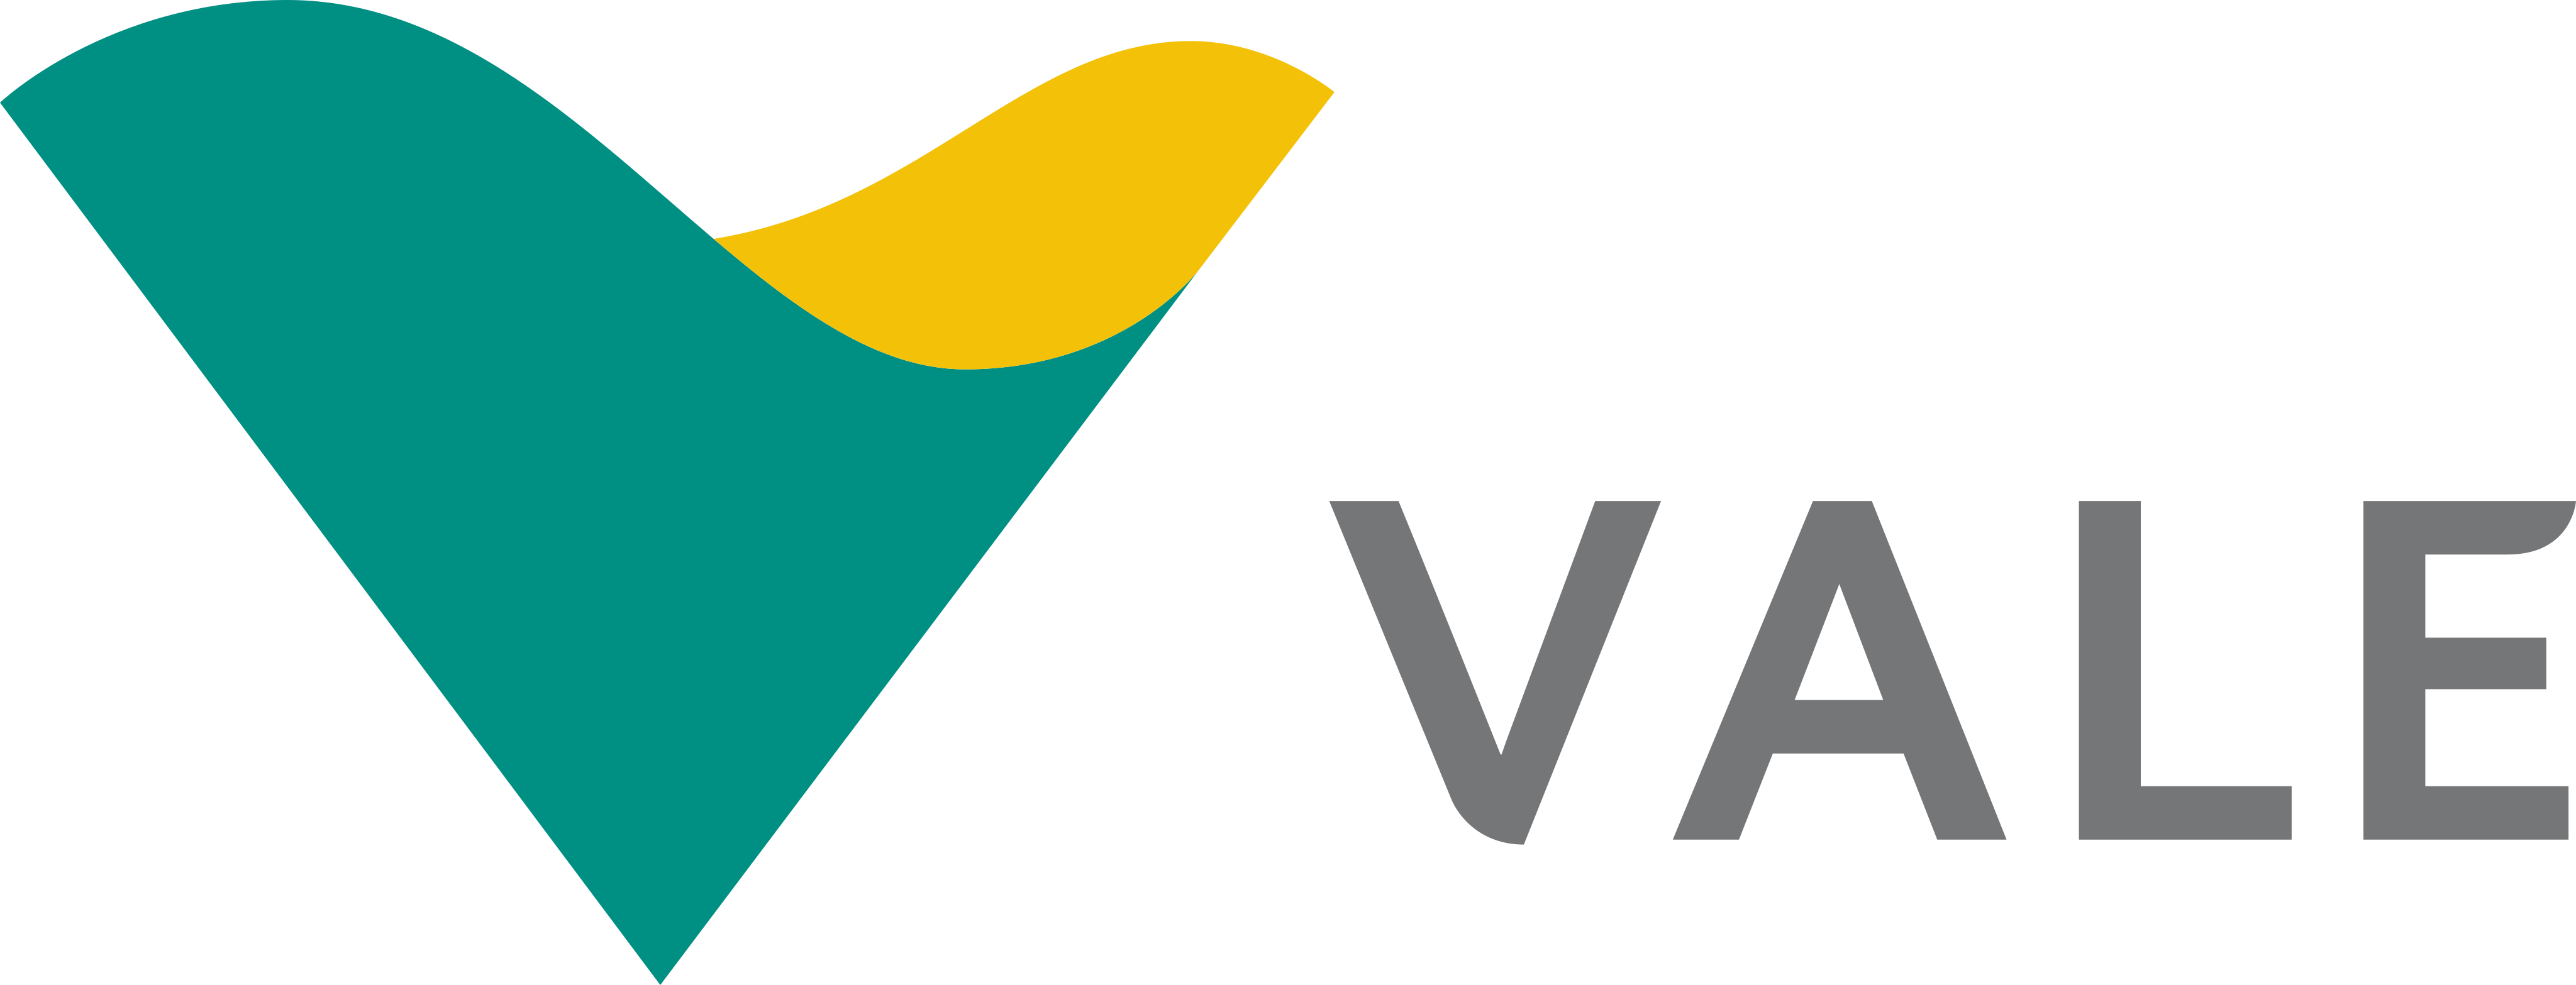 vale logo 8 - Vale Logo - Mineradora